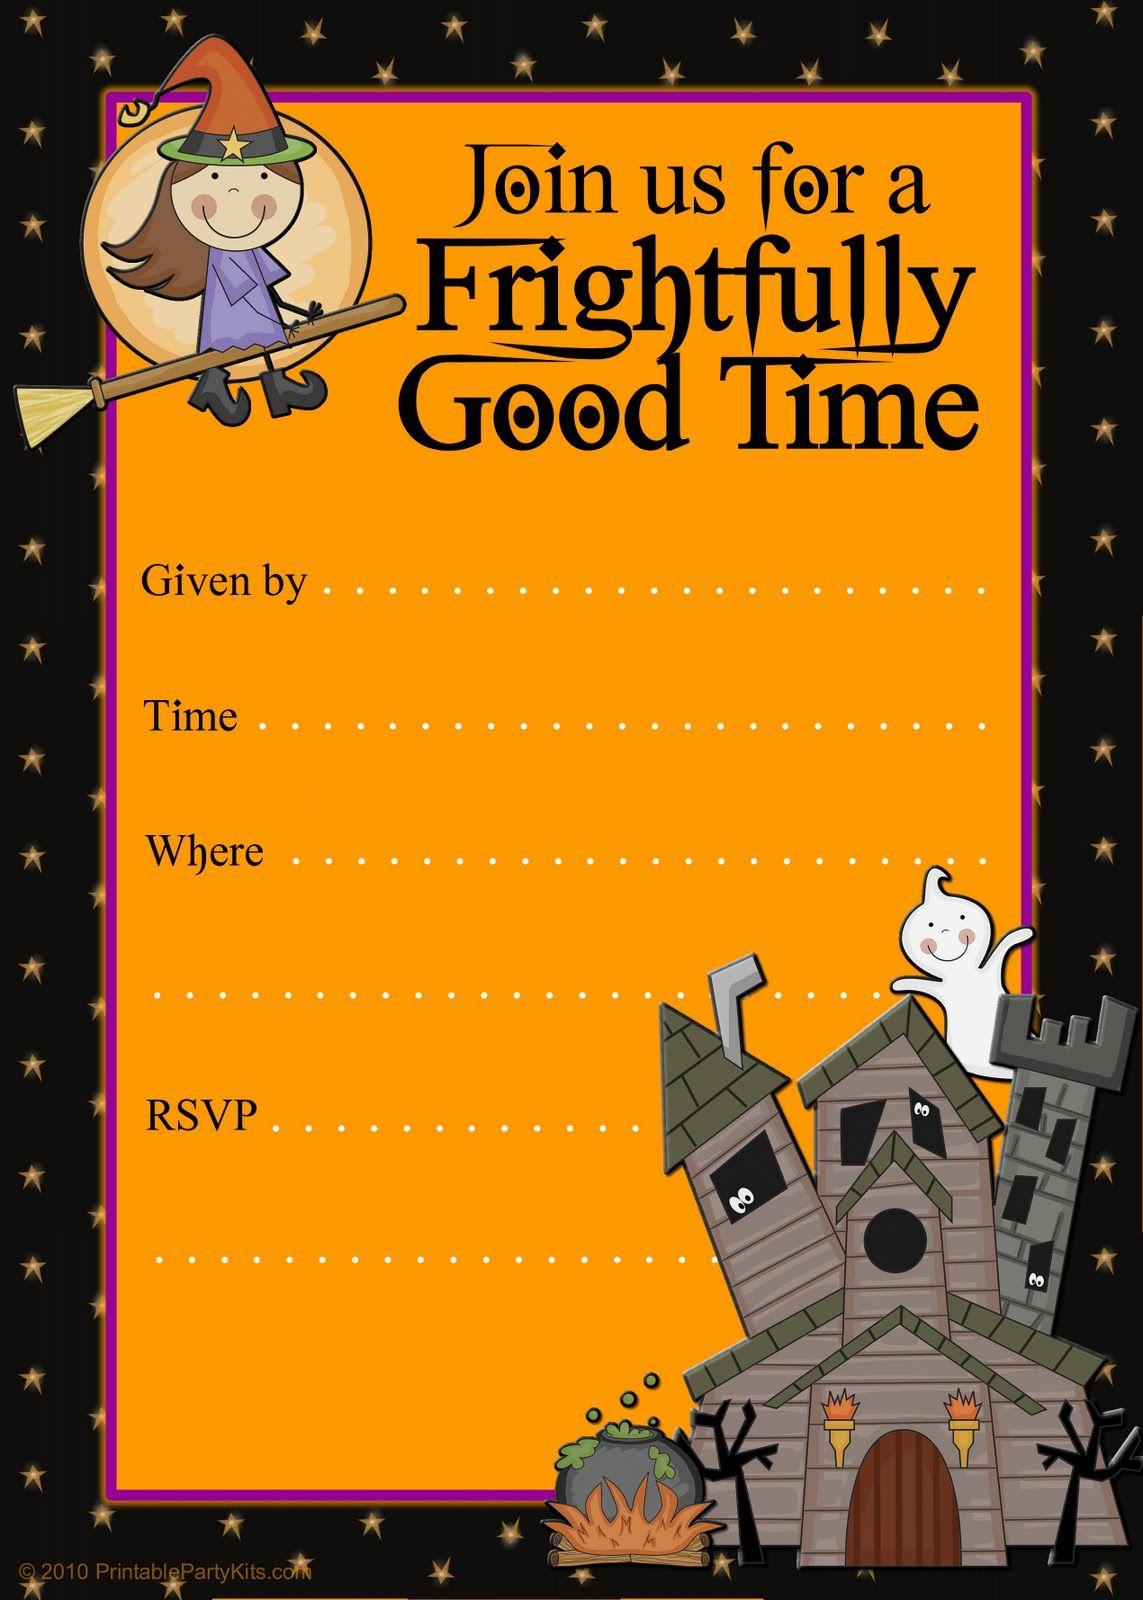 Free Halloween Flyer Invitations Printable | Food | Pinterest - Free Printable Halloween Invitations For Adults